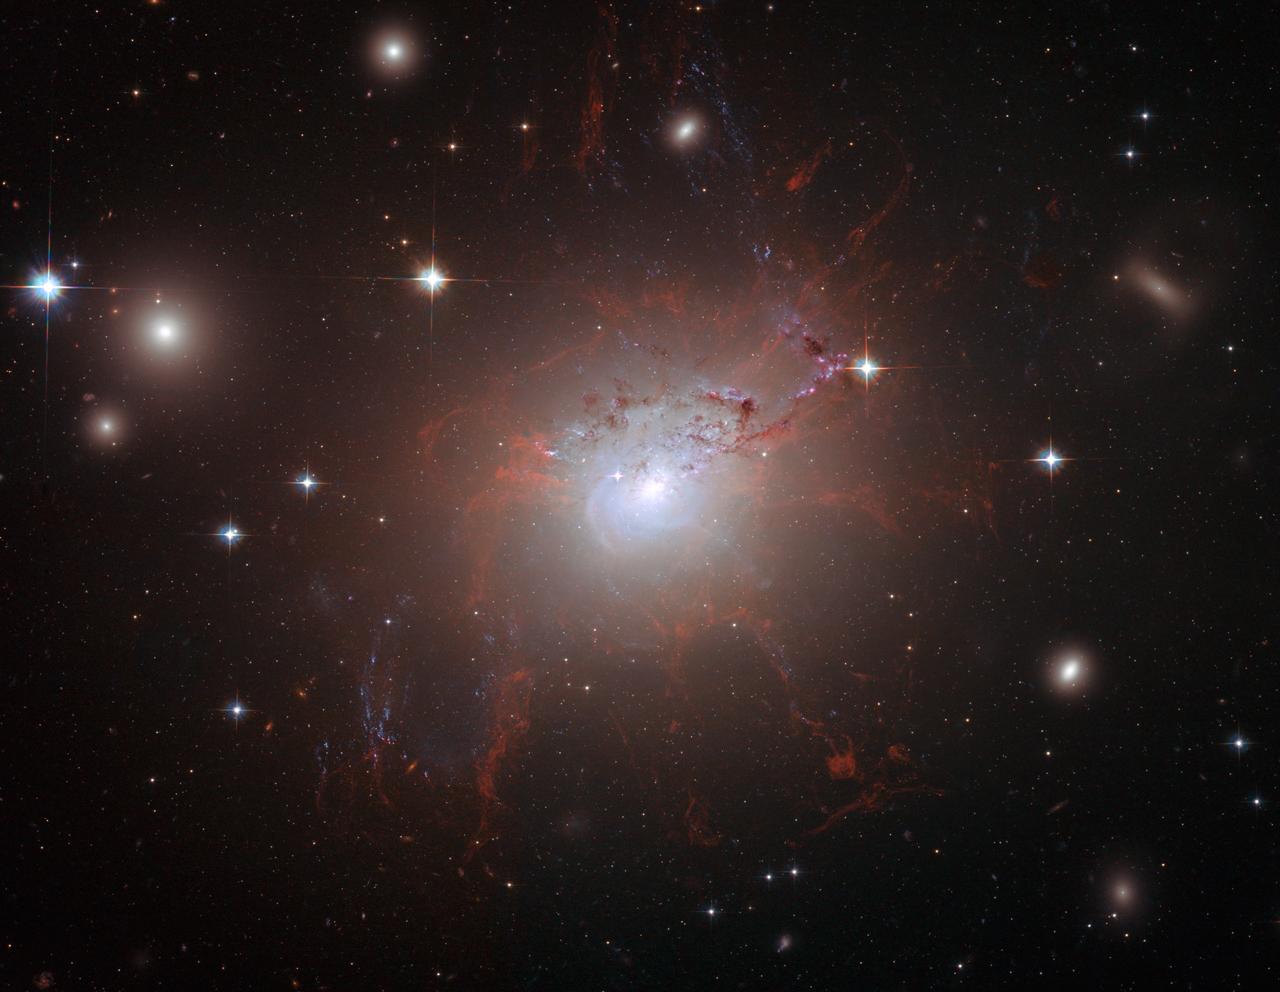 NASA, ESA, Hubble Heritage (STScI/AURA); A. Fabian (IoA, Cambridge U.), L. Frattare (STScI), CXC, G. Taylor, NRAO,VLA